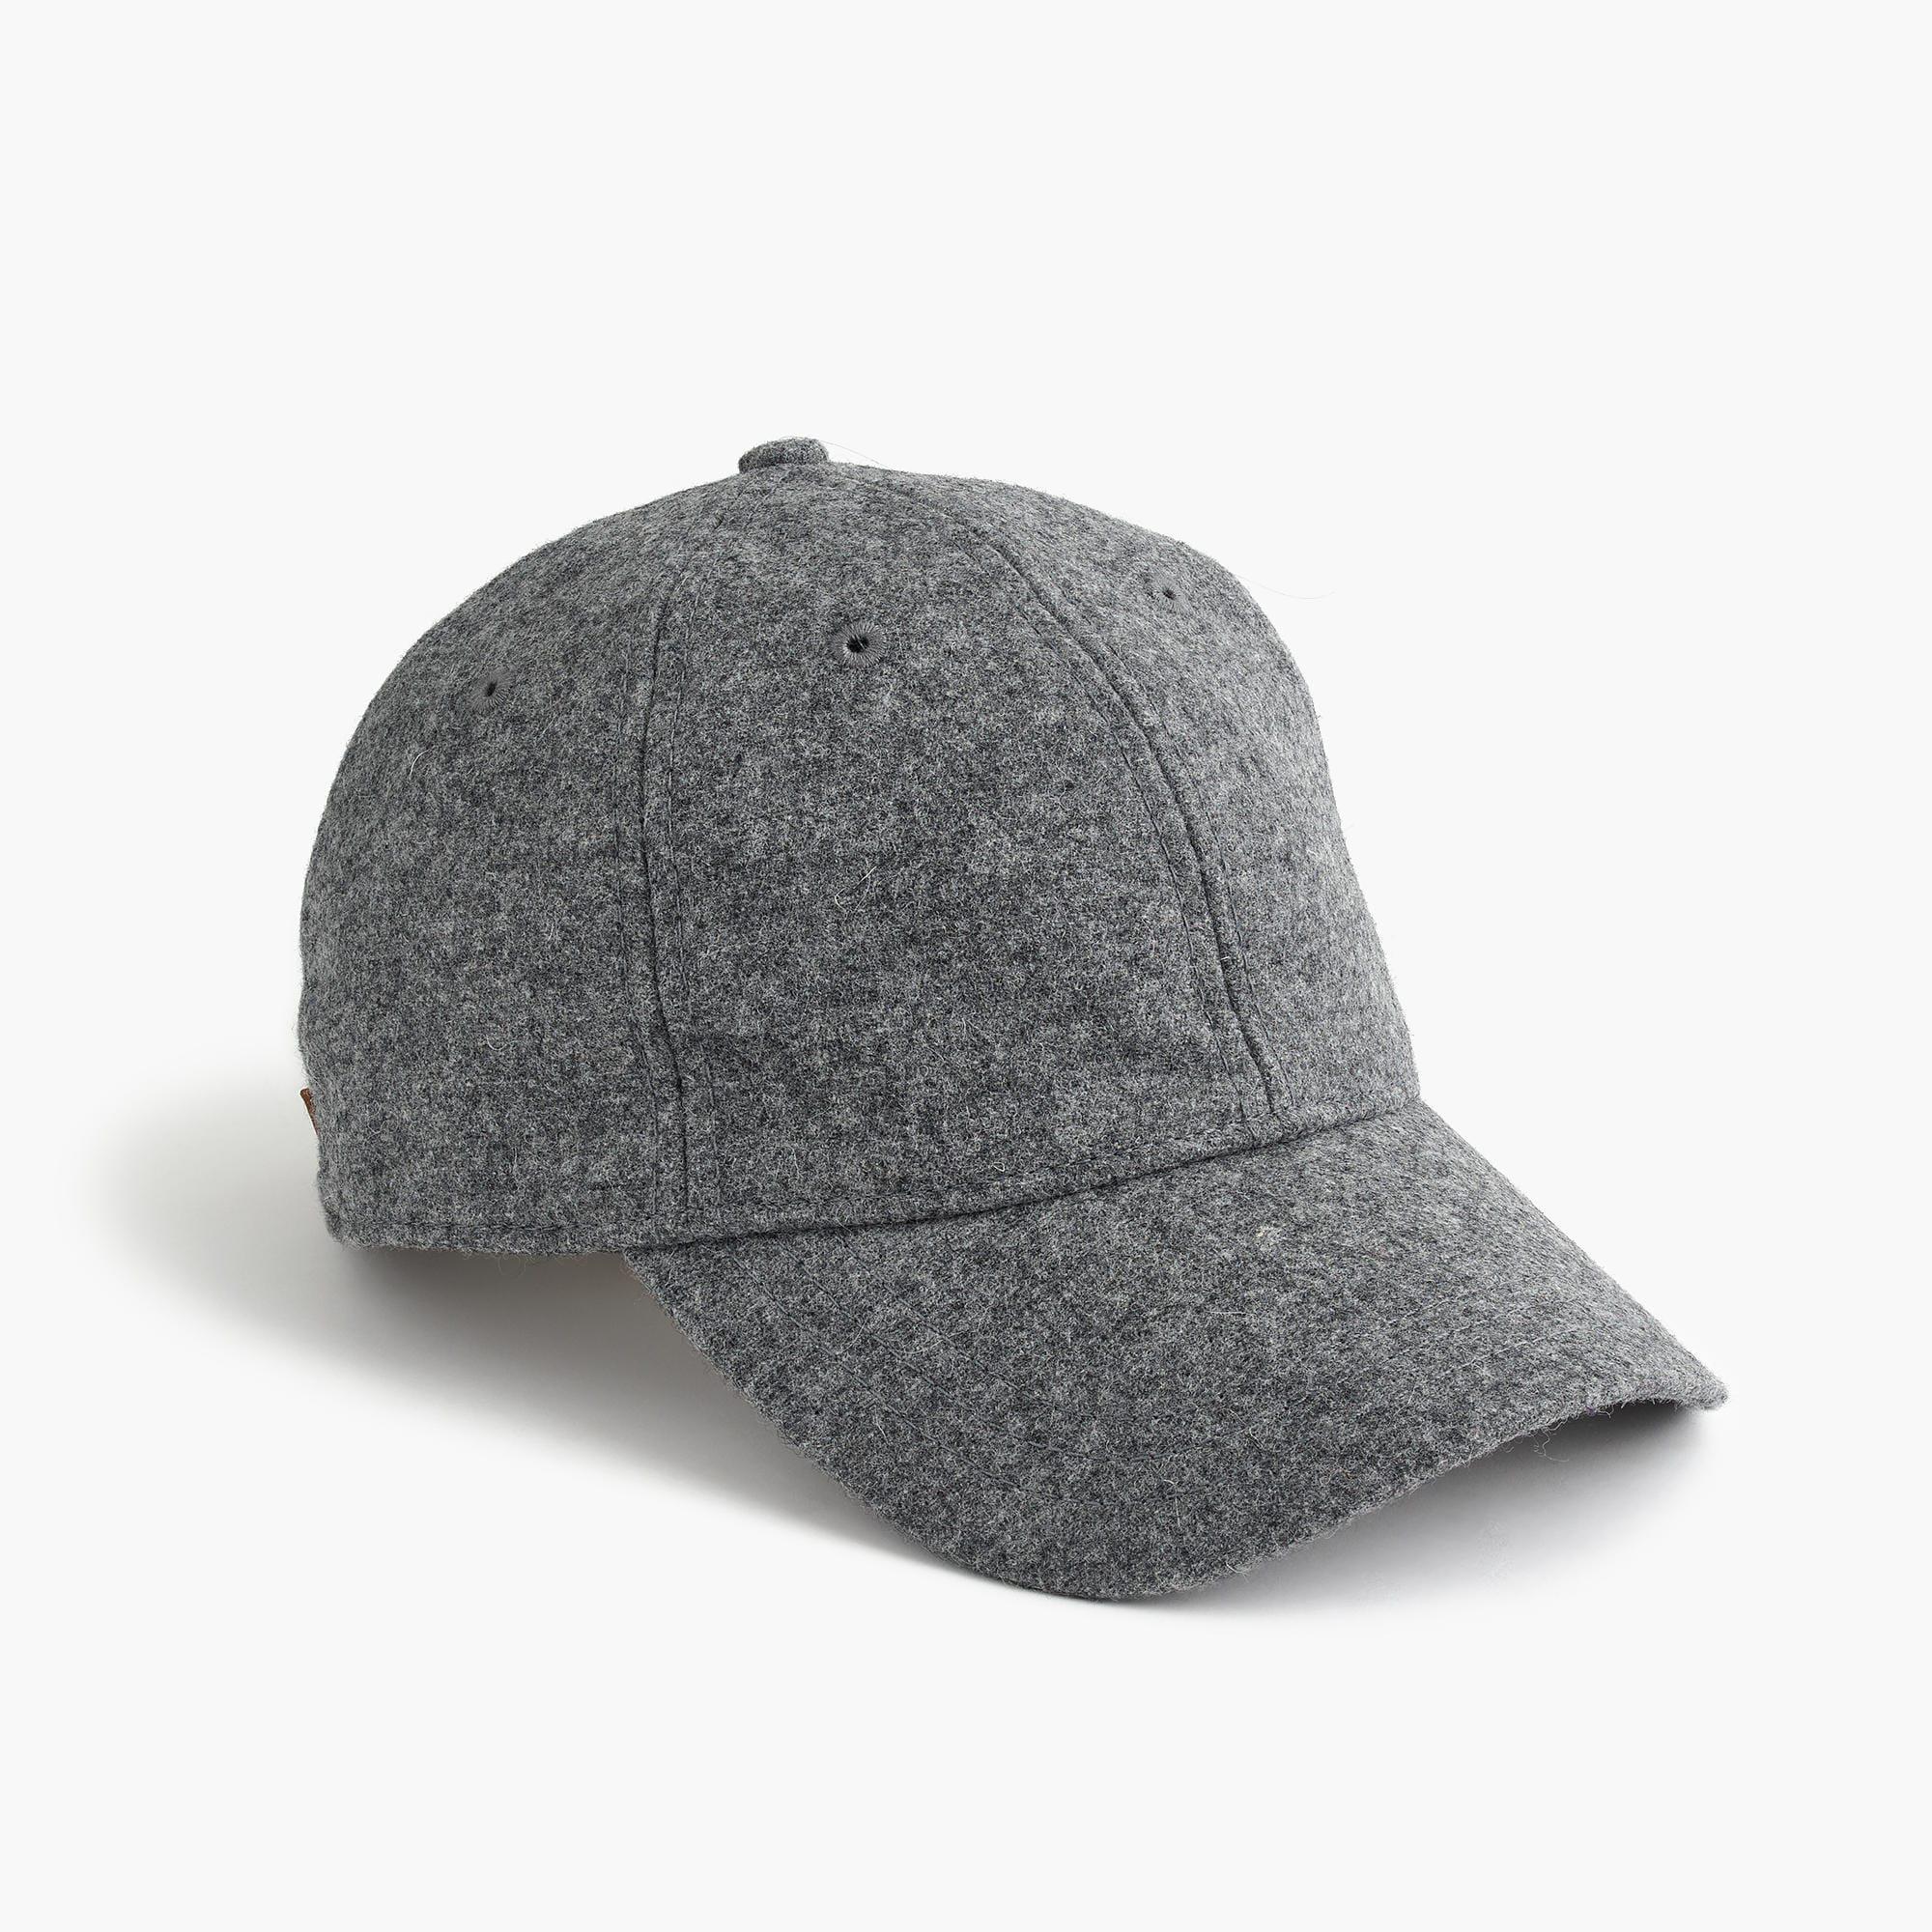 3a9441ce30e Lyst - J.Crew Grey Wool Ball Cap in Gray for Men